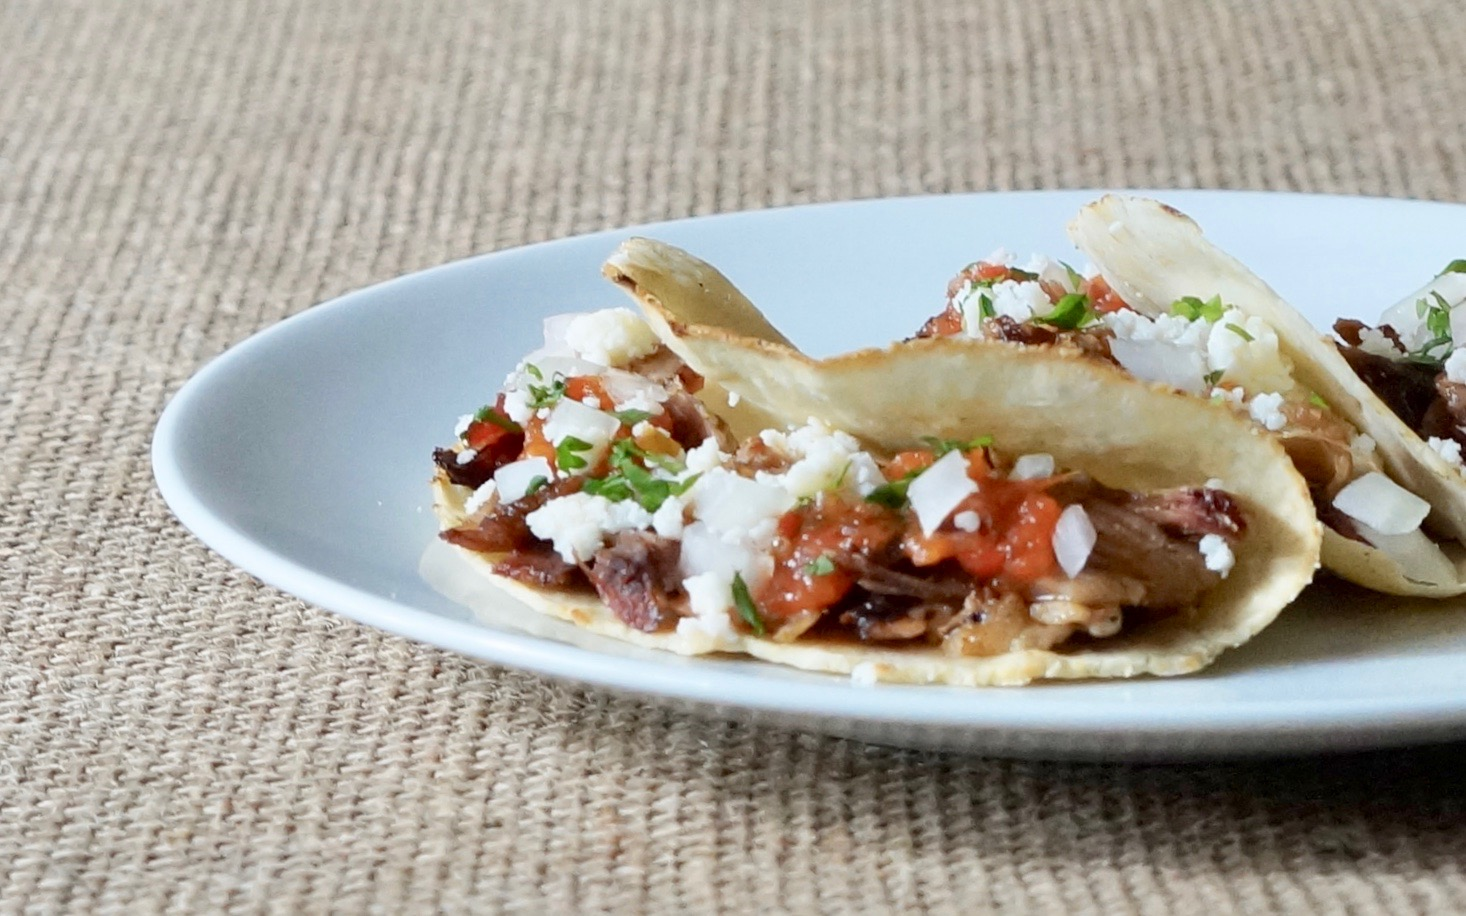 Smoked-Pork-Street-Tacos-With-Salsa-Roja-Rebecca-Gordon-Editor-In-Chief-Buttermilk-Lipstick-Culinary-Techniques-RebeccaGordon-Southern-Hostess-Pastry-Chef-Garden-Recipes-Birmingham-Alabama